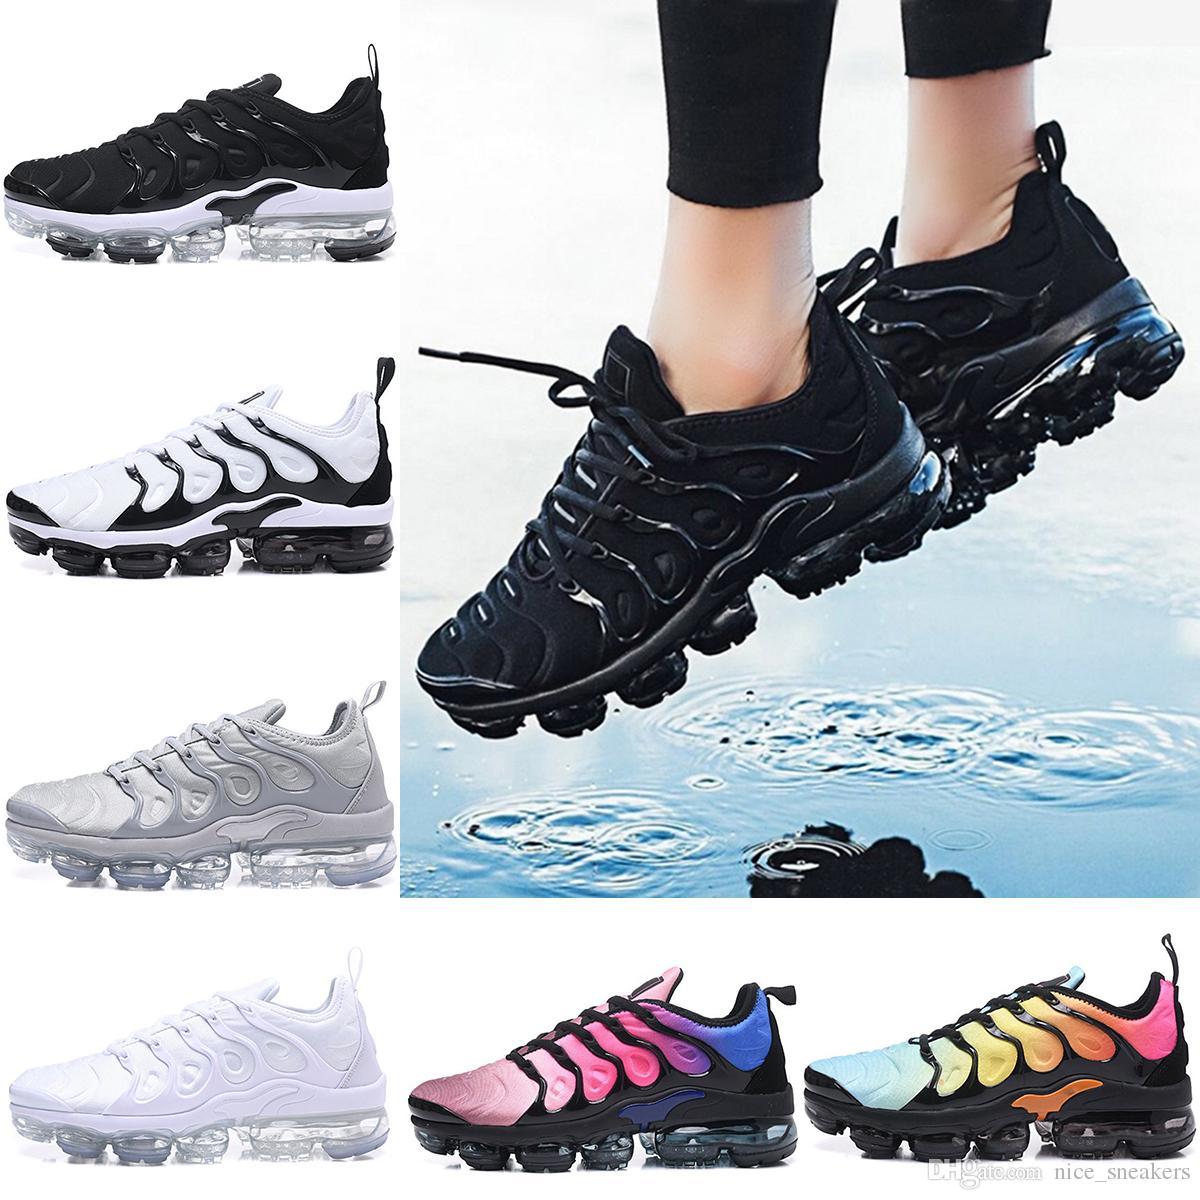 2018 Nuevo Vapormax TN Plus Zapatos Hombre Running Zapatos Plus Triple S Blanco Negro 94c04a